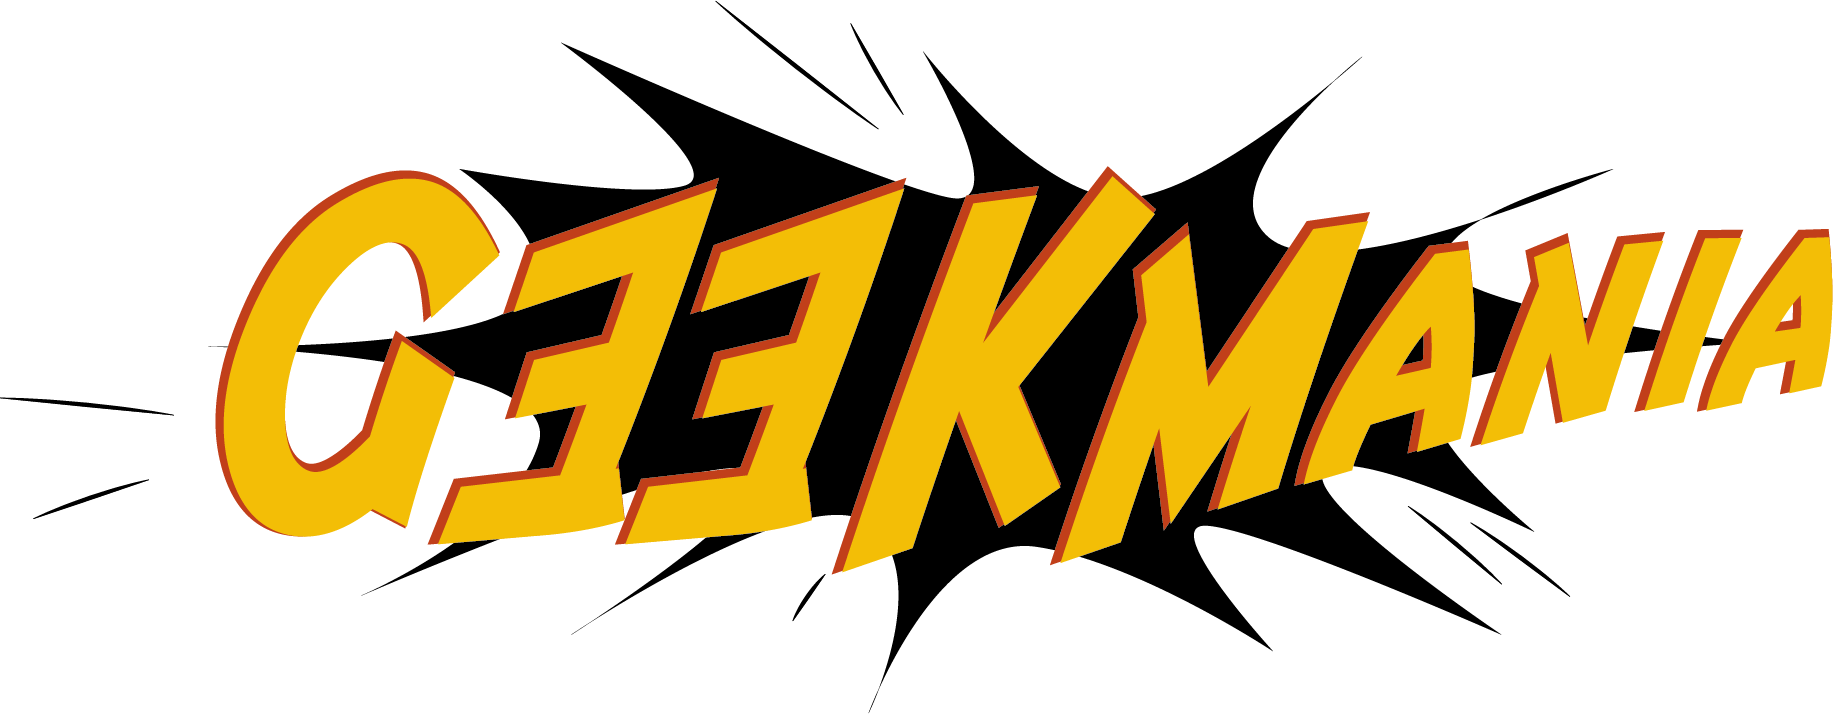 Logotype G33kmania